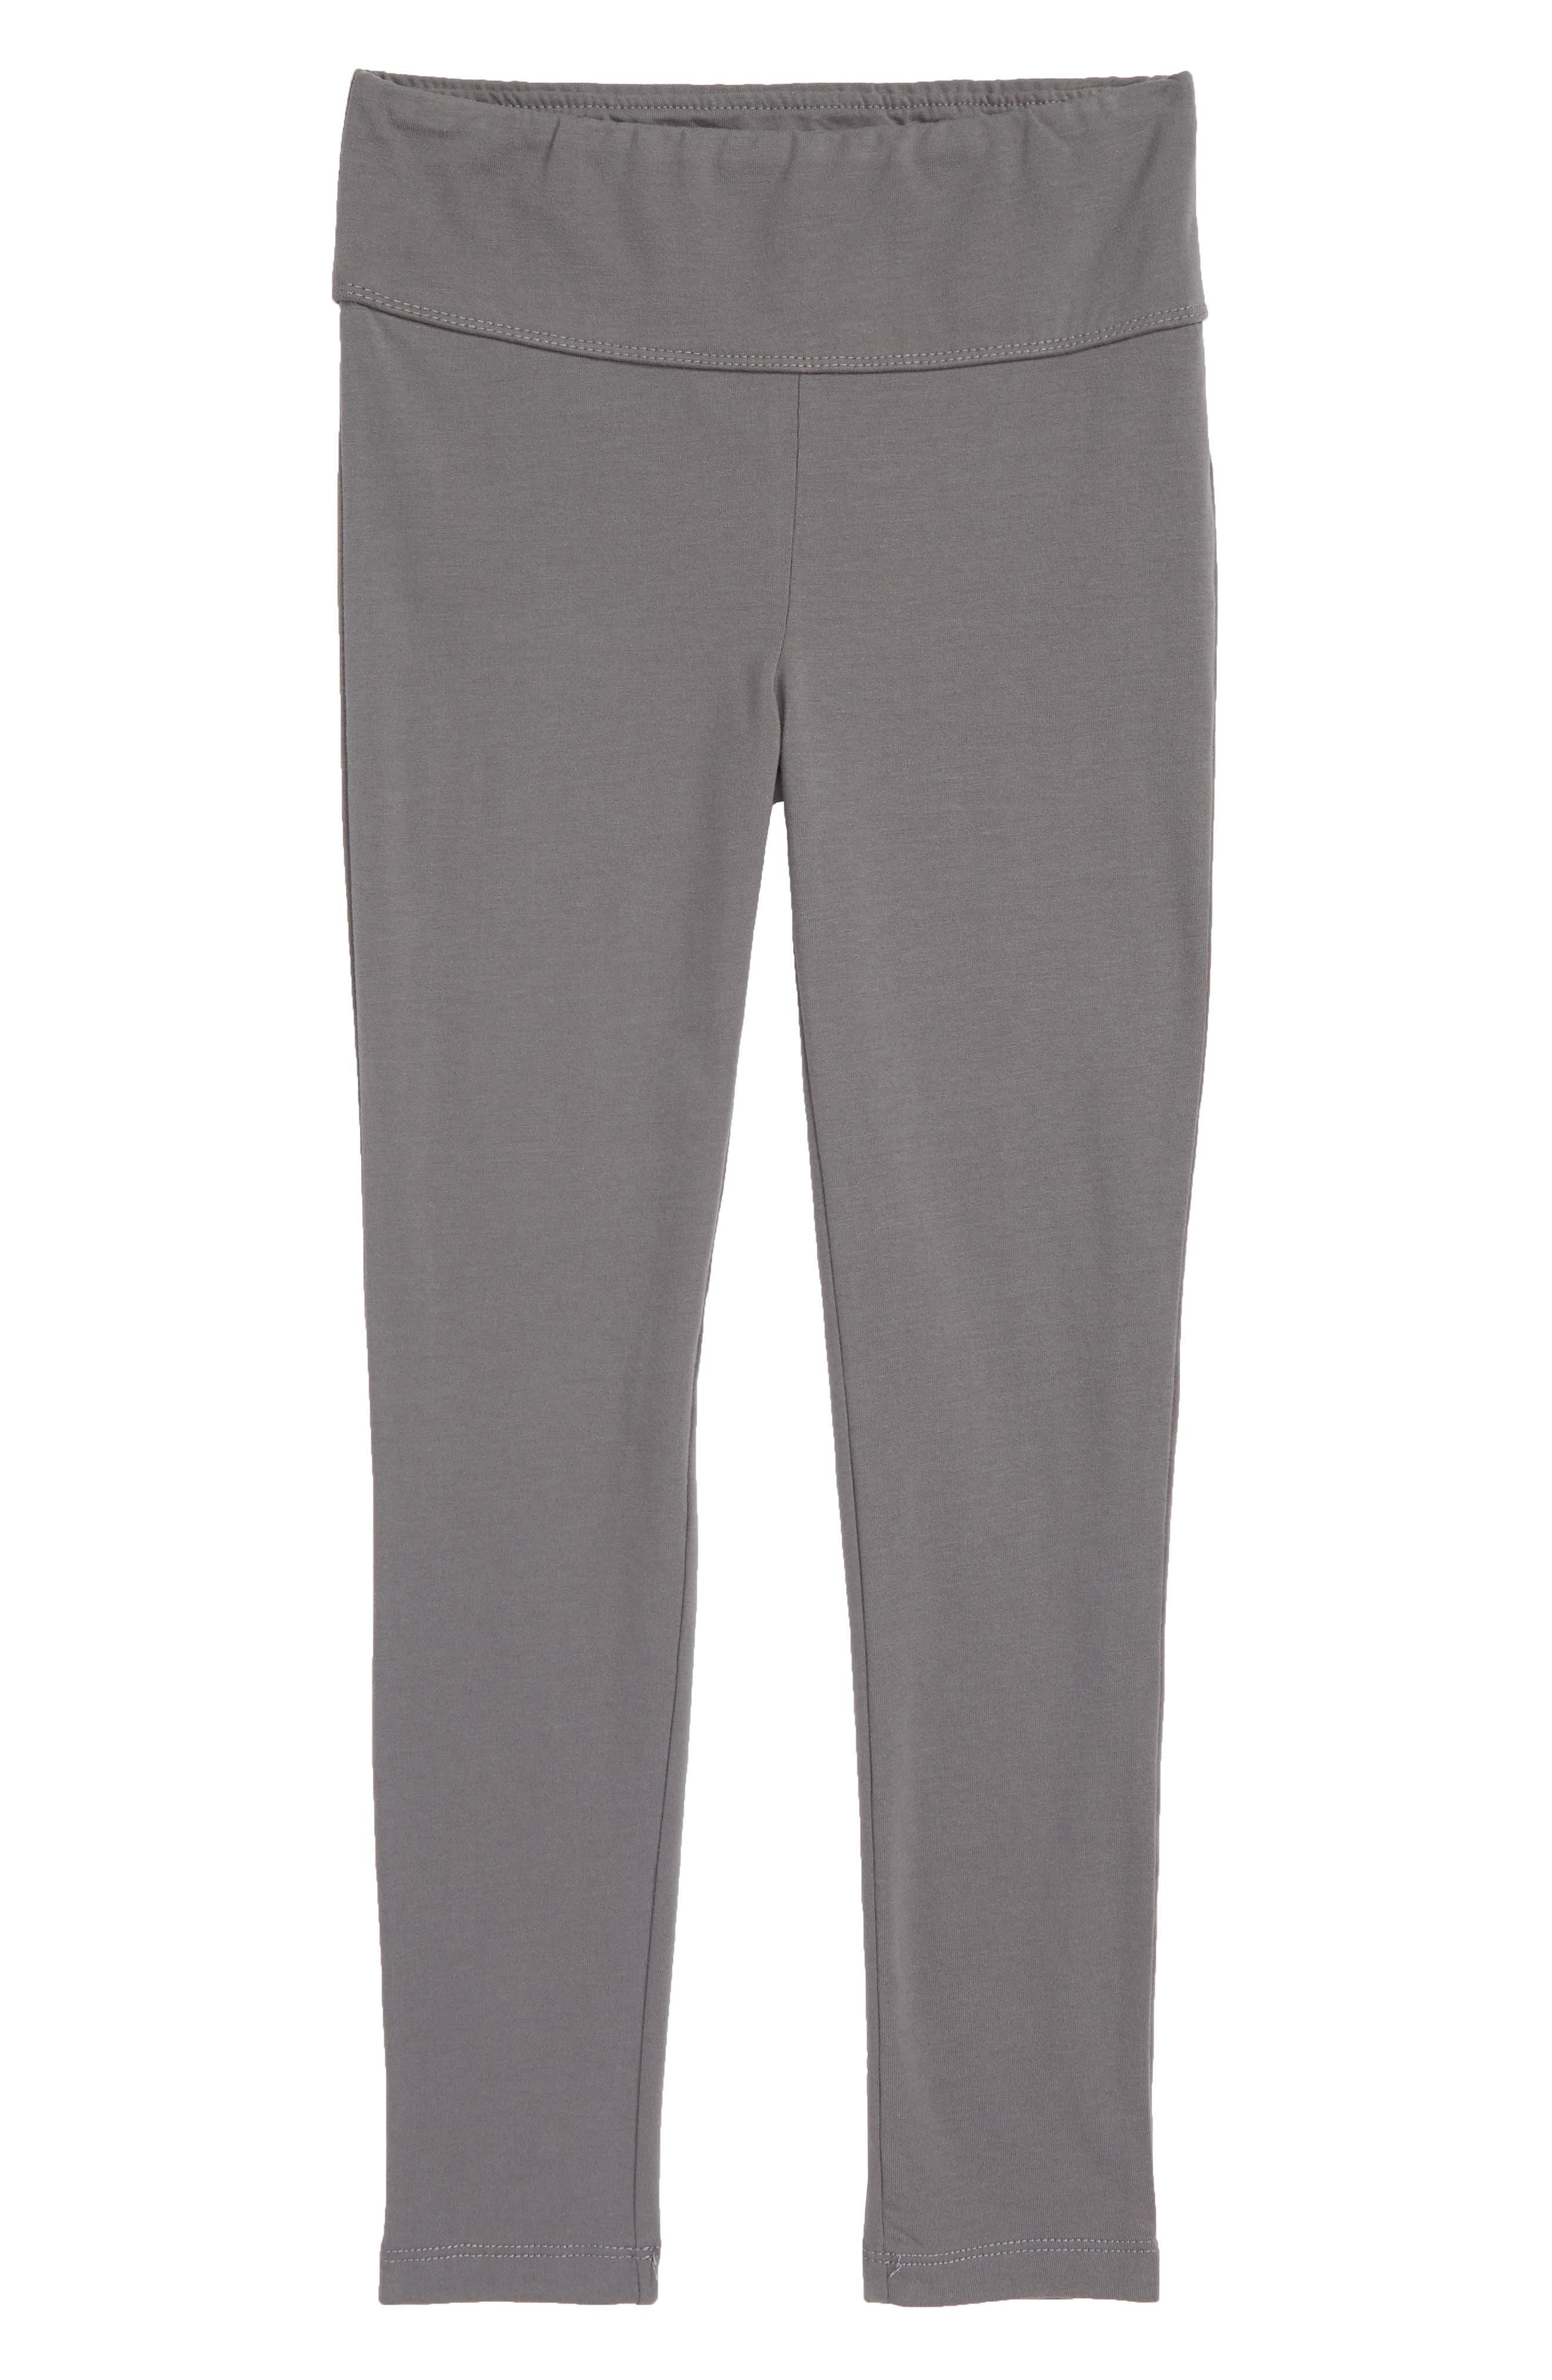 Girls Tucker  Tate High Waist Leggings Size XL (1416)  Grey